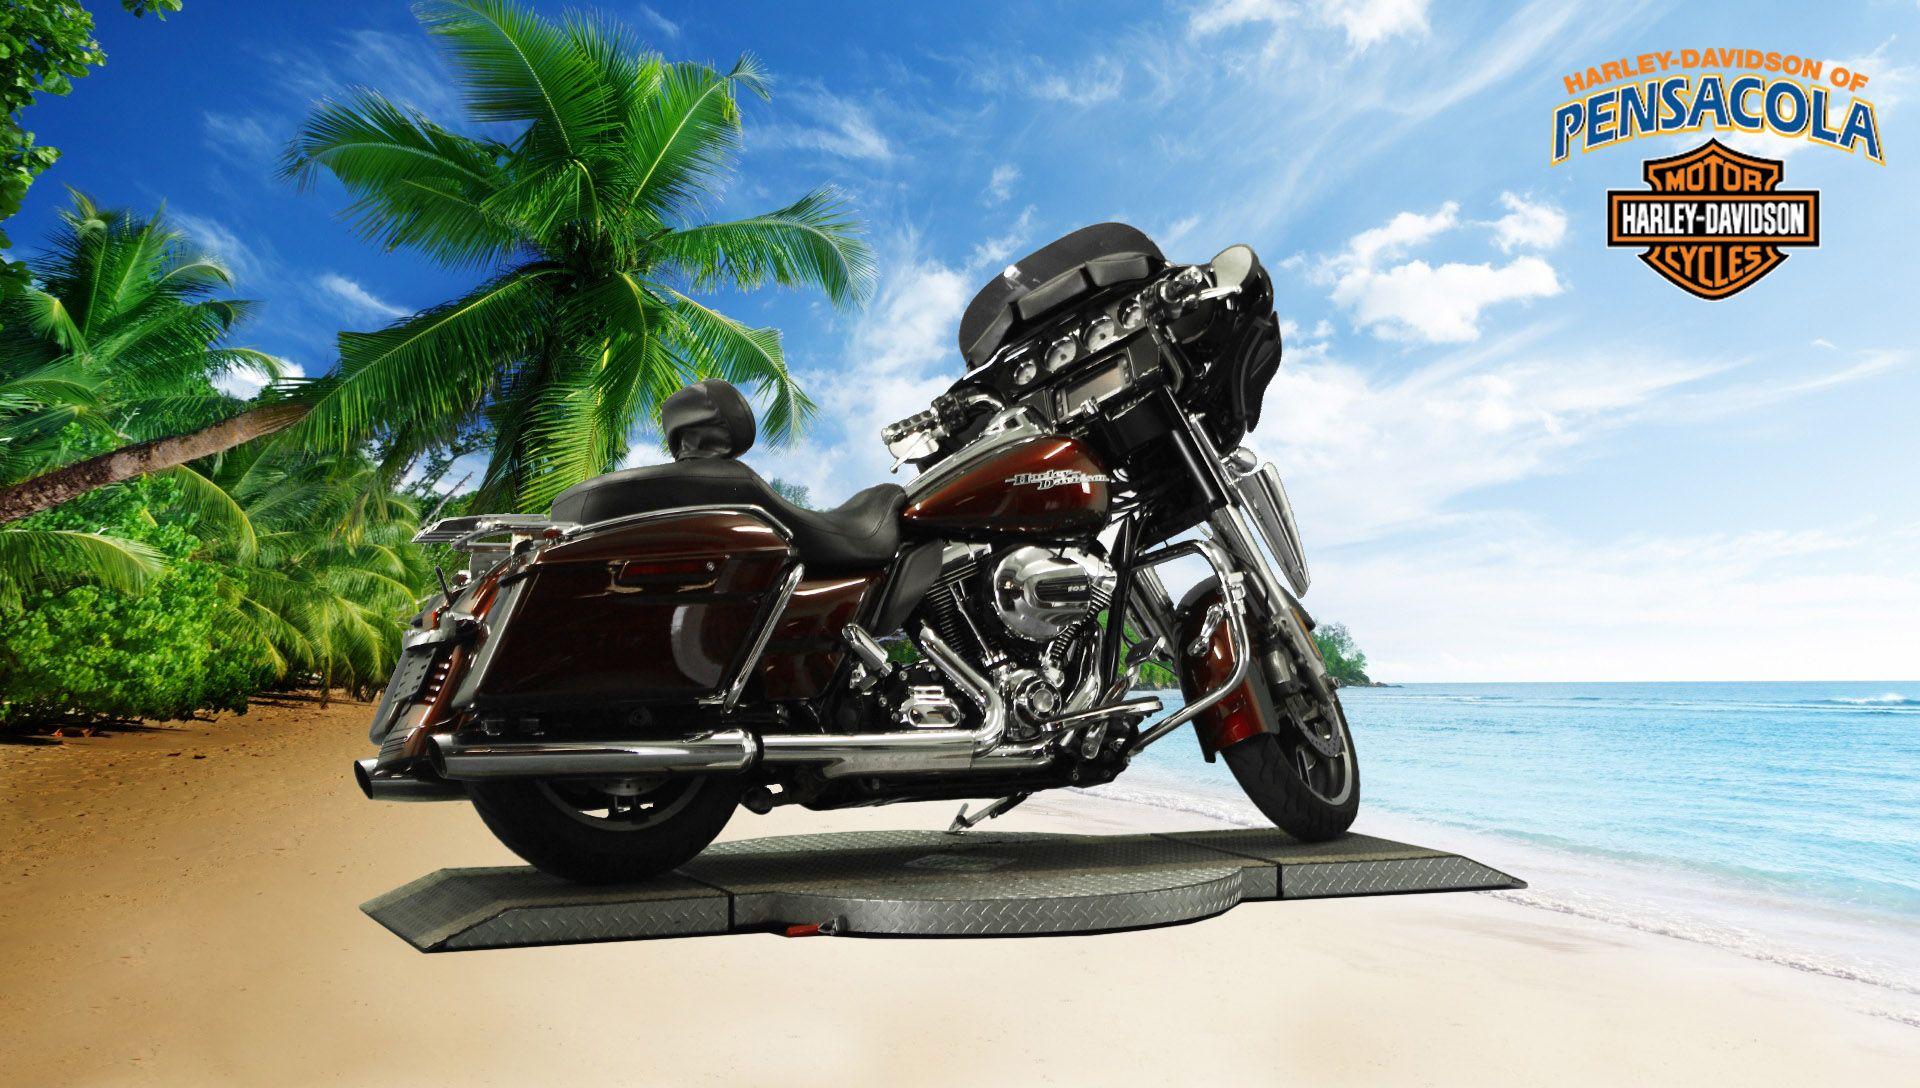 Pre-Owned 2014 Harley-Davidson Street Glide Special FLHXS